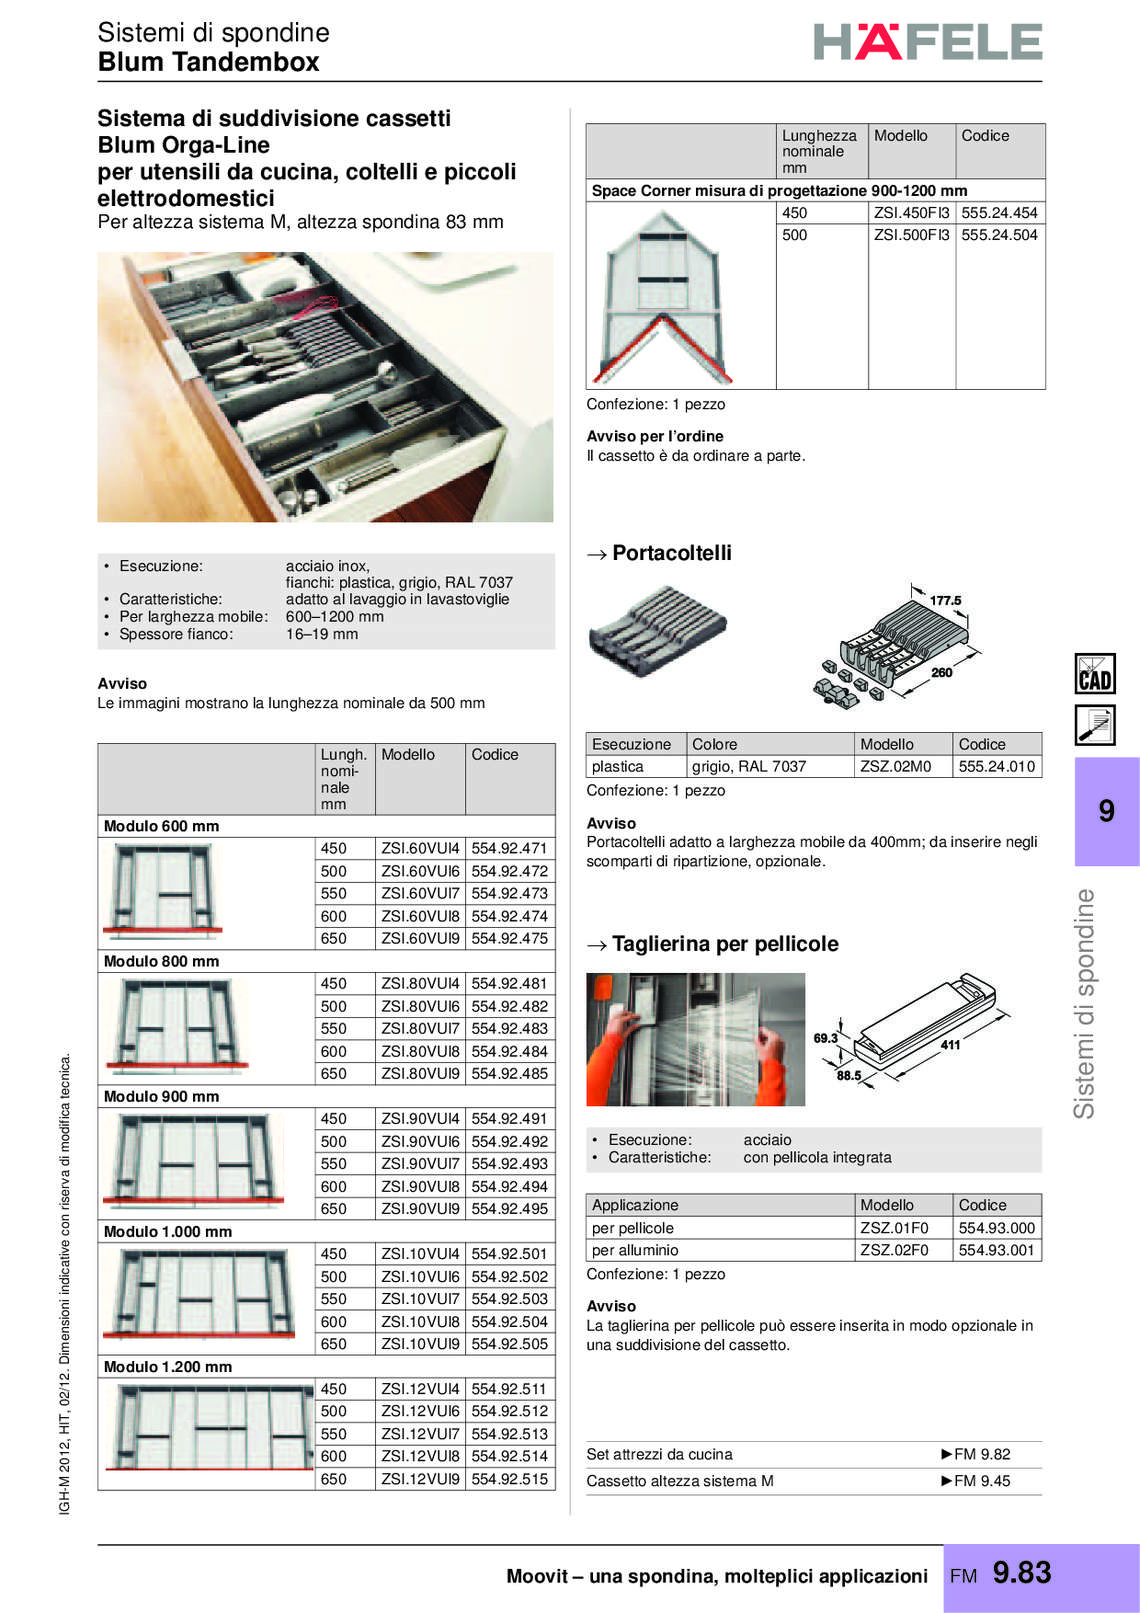 hafele-spondine-e-guide-per-mobili_40_106.jpg